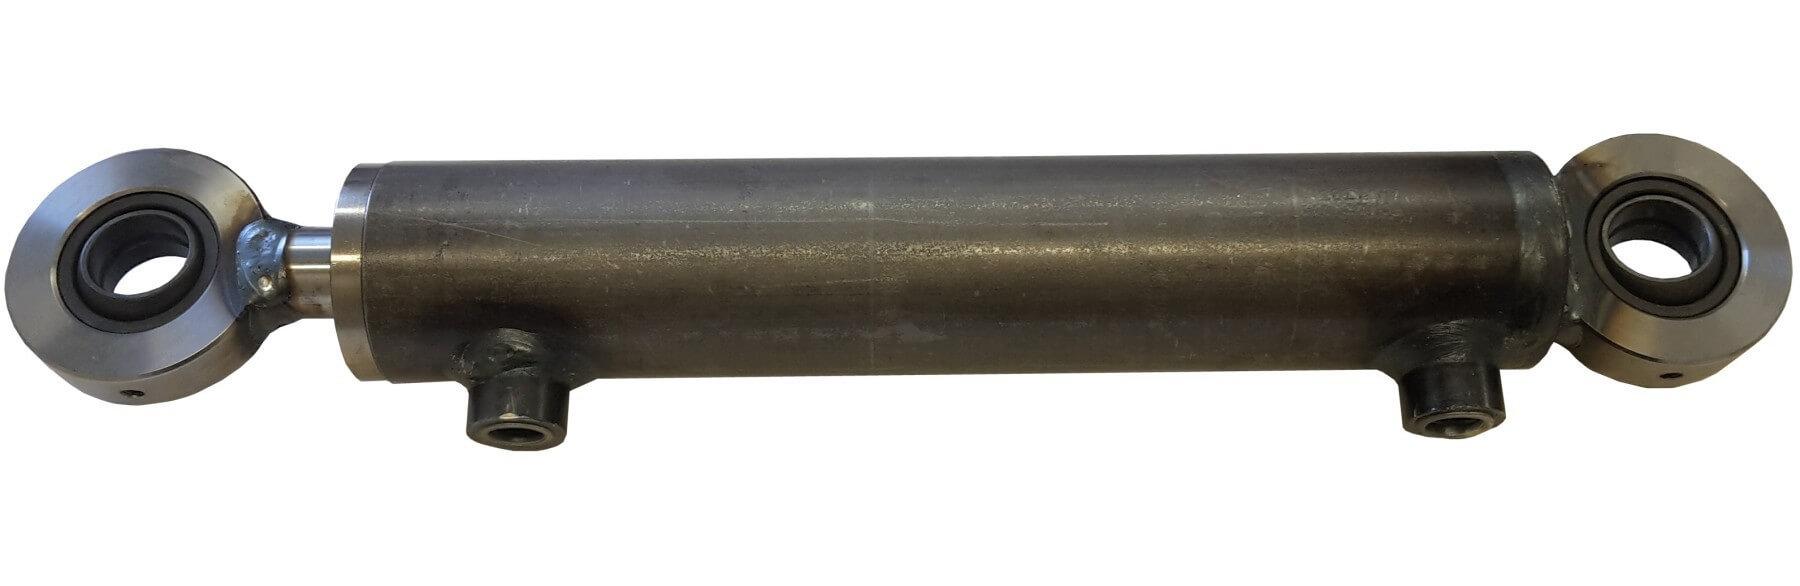 Hydraulisylinteri CL 70. 40. 1100 GE